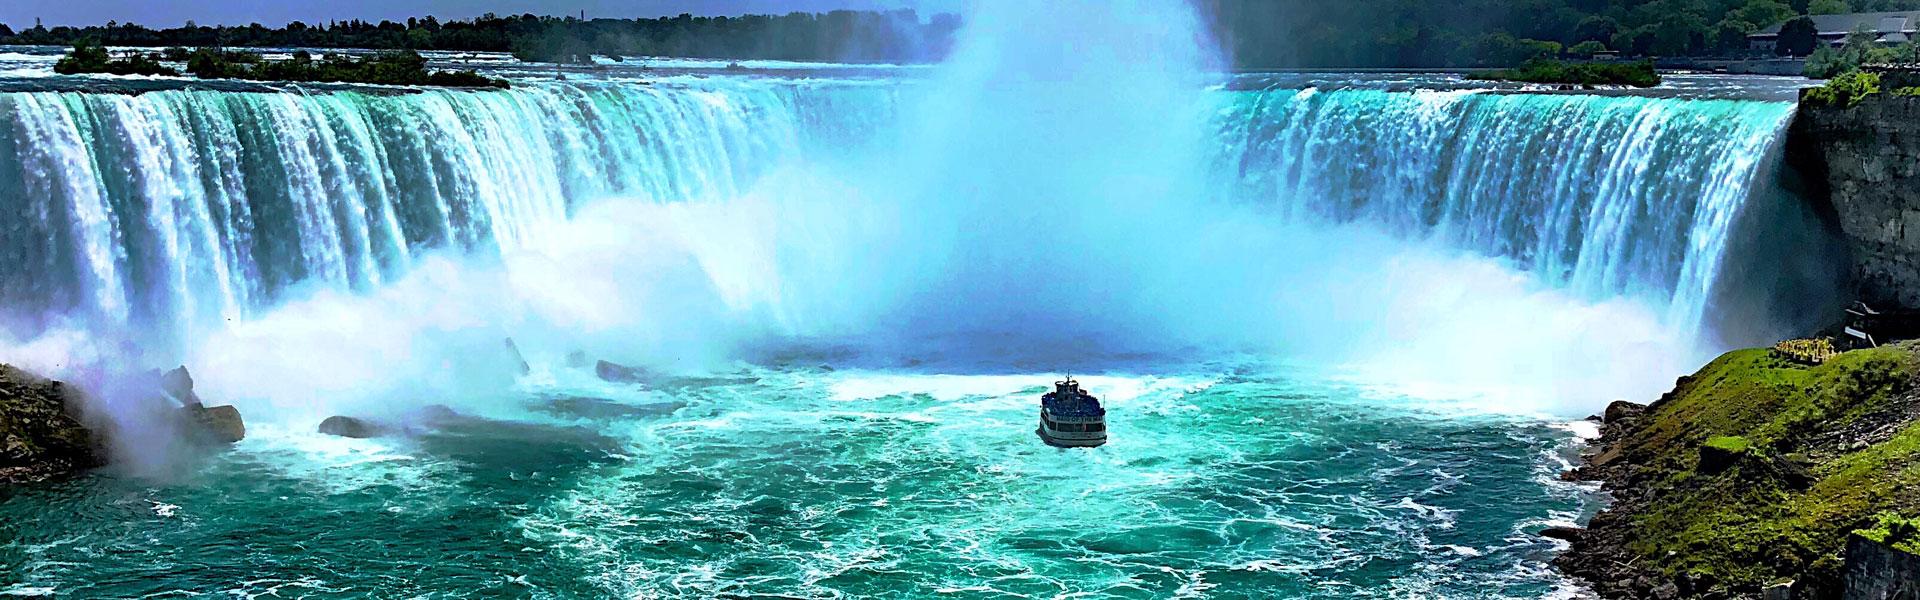 A Tour to Niagara Falls